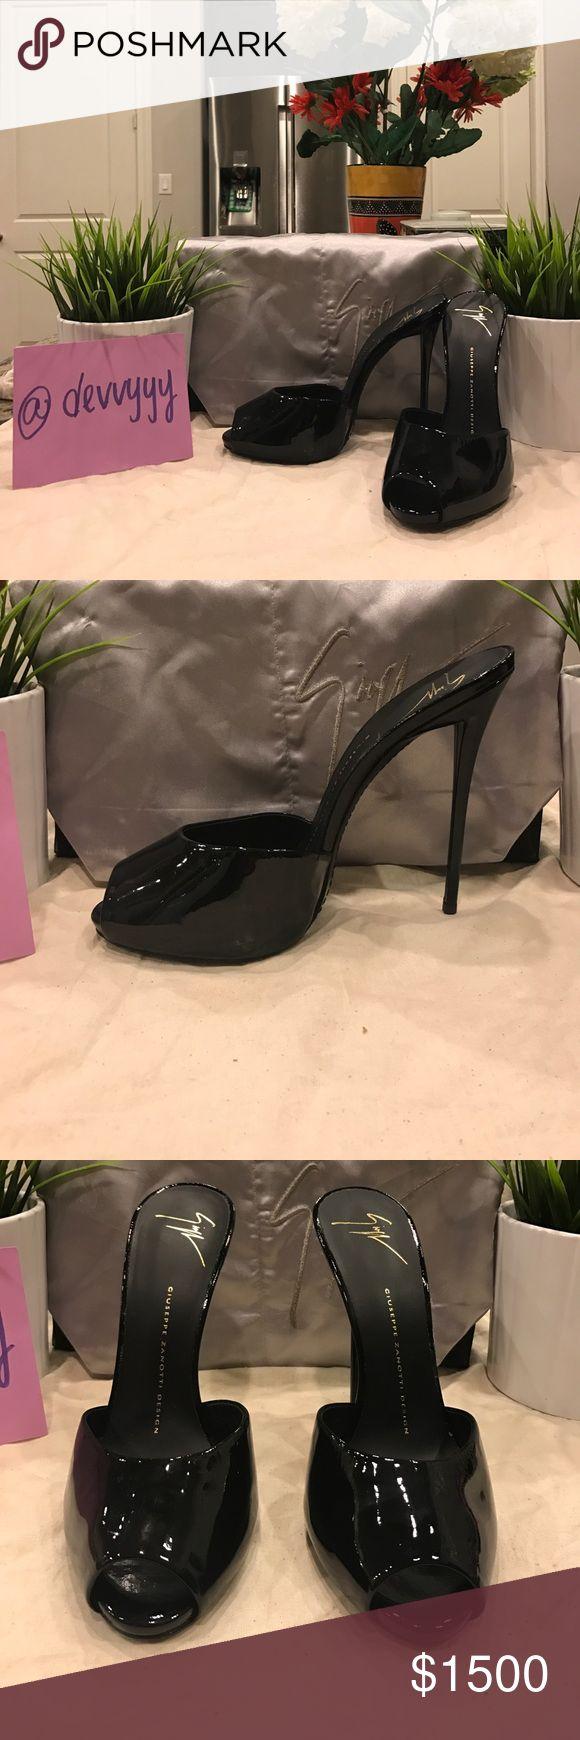 Giuseppe Giuseppe Zanotti black peep toe heels 😍 Beautiful and never been worn 😍 no signs of flaws Giuseppe Zanotti Shoes Heels